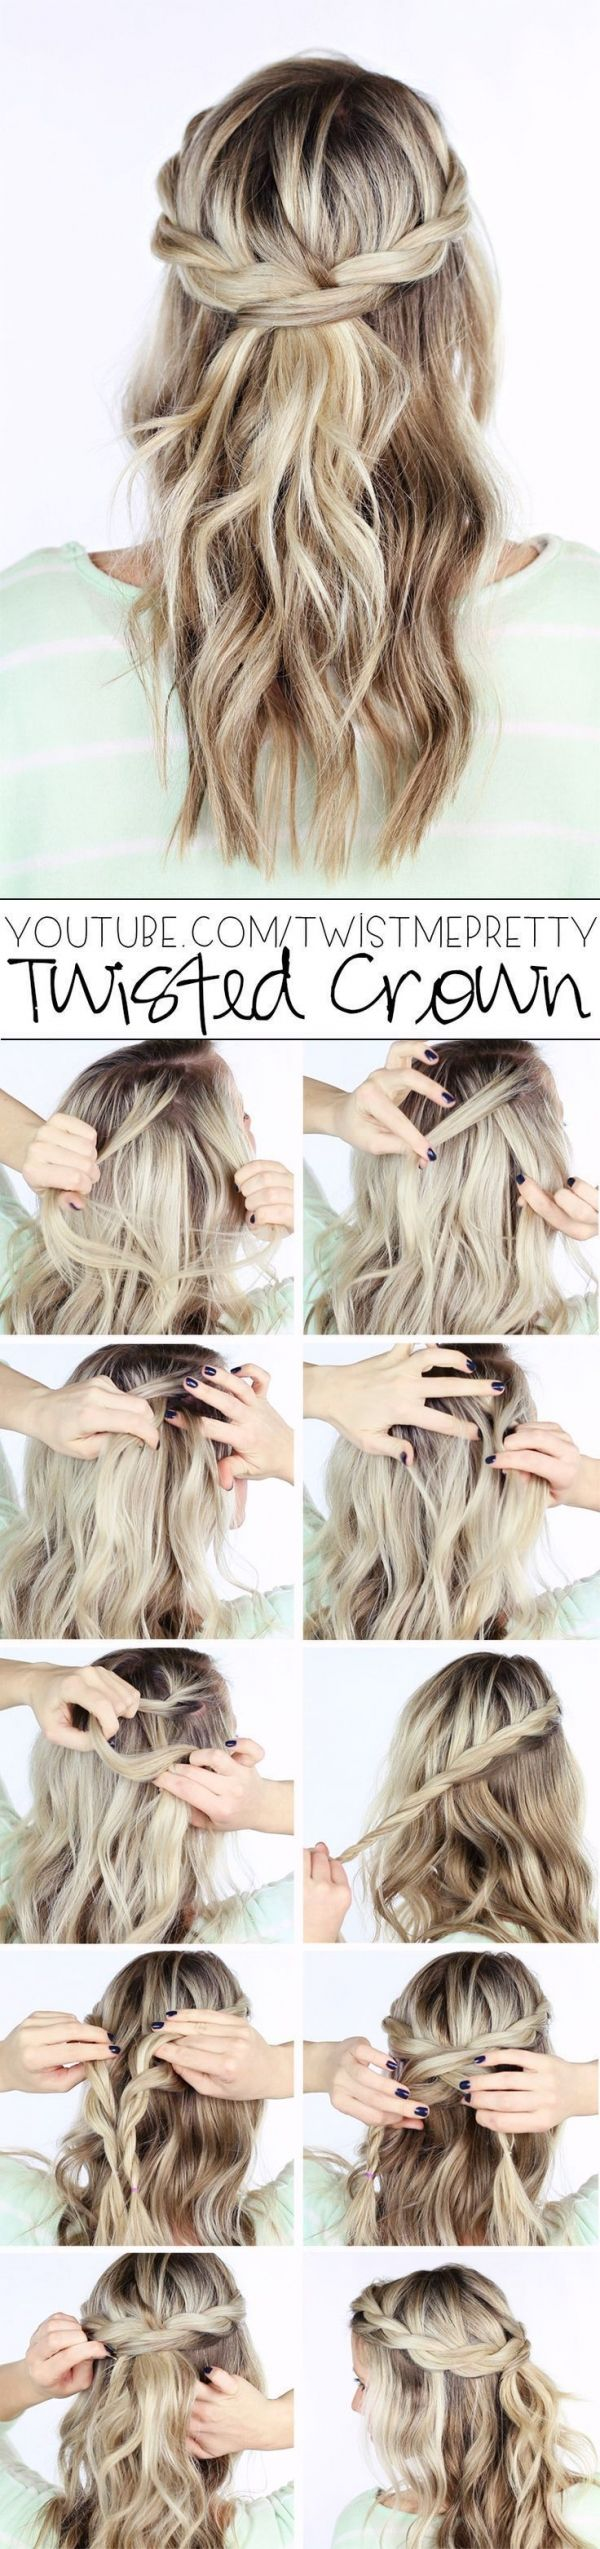 Awe Inspiring 1000 Ideas About Braided Hair Tutorials On Pinterest Braid Hair Short Hairstyles For Black Women Fulllsitofus